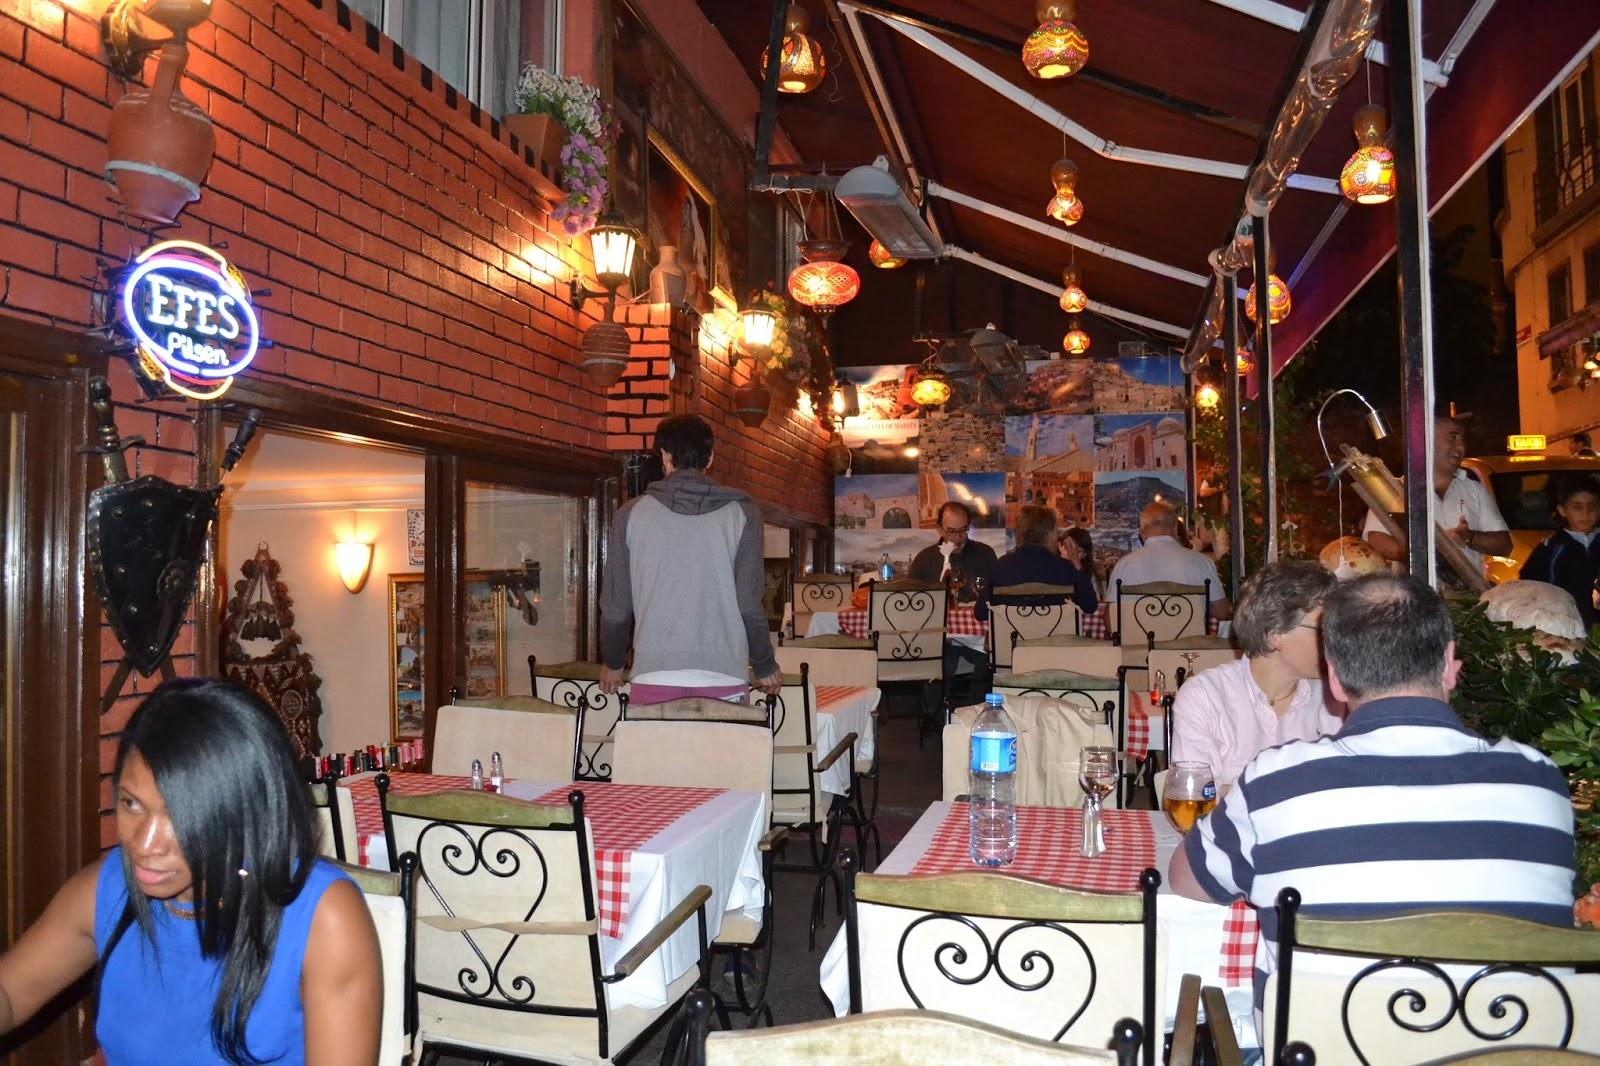 kosk restaurant, Istanbul